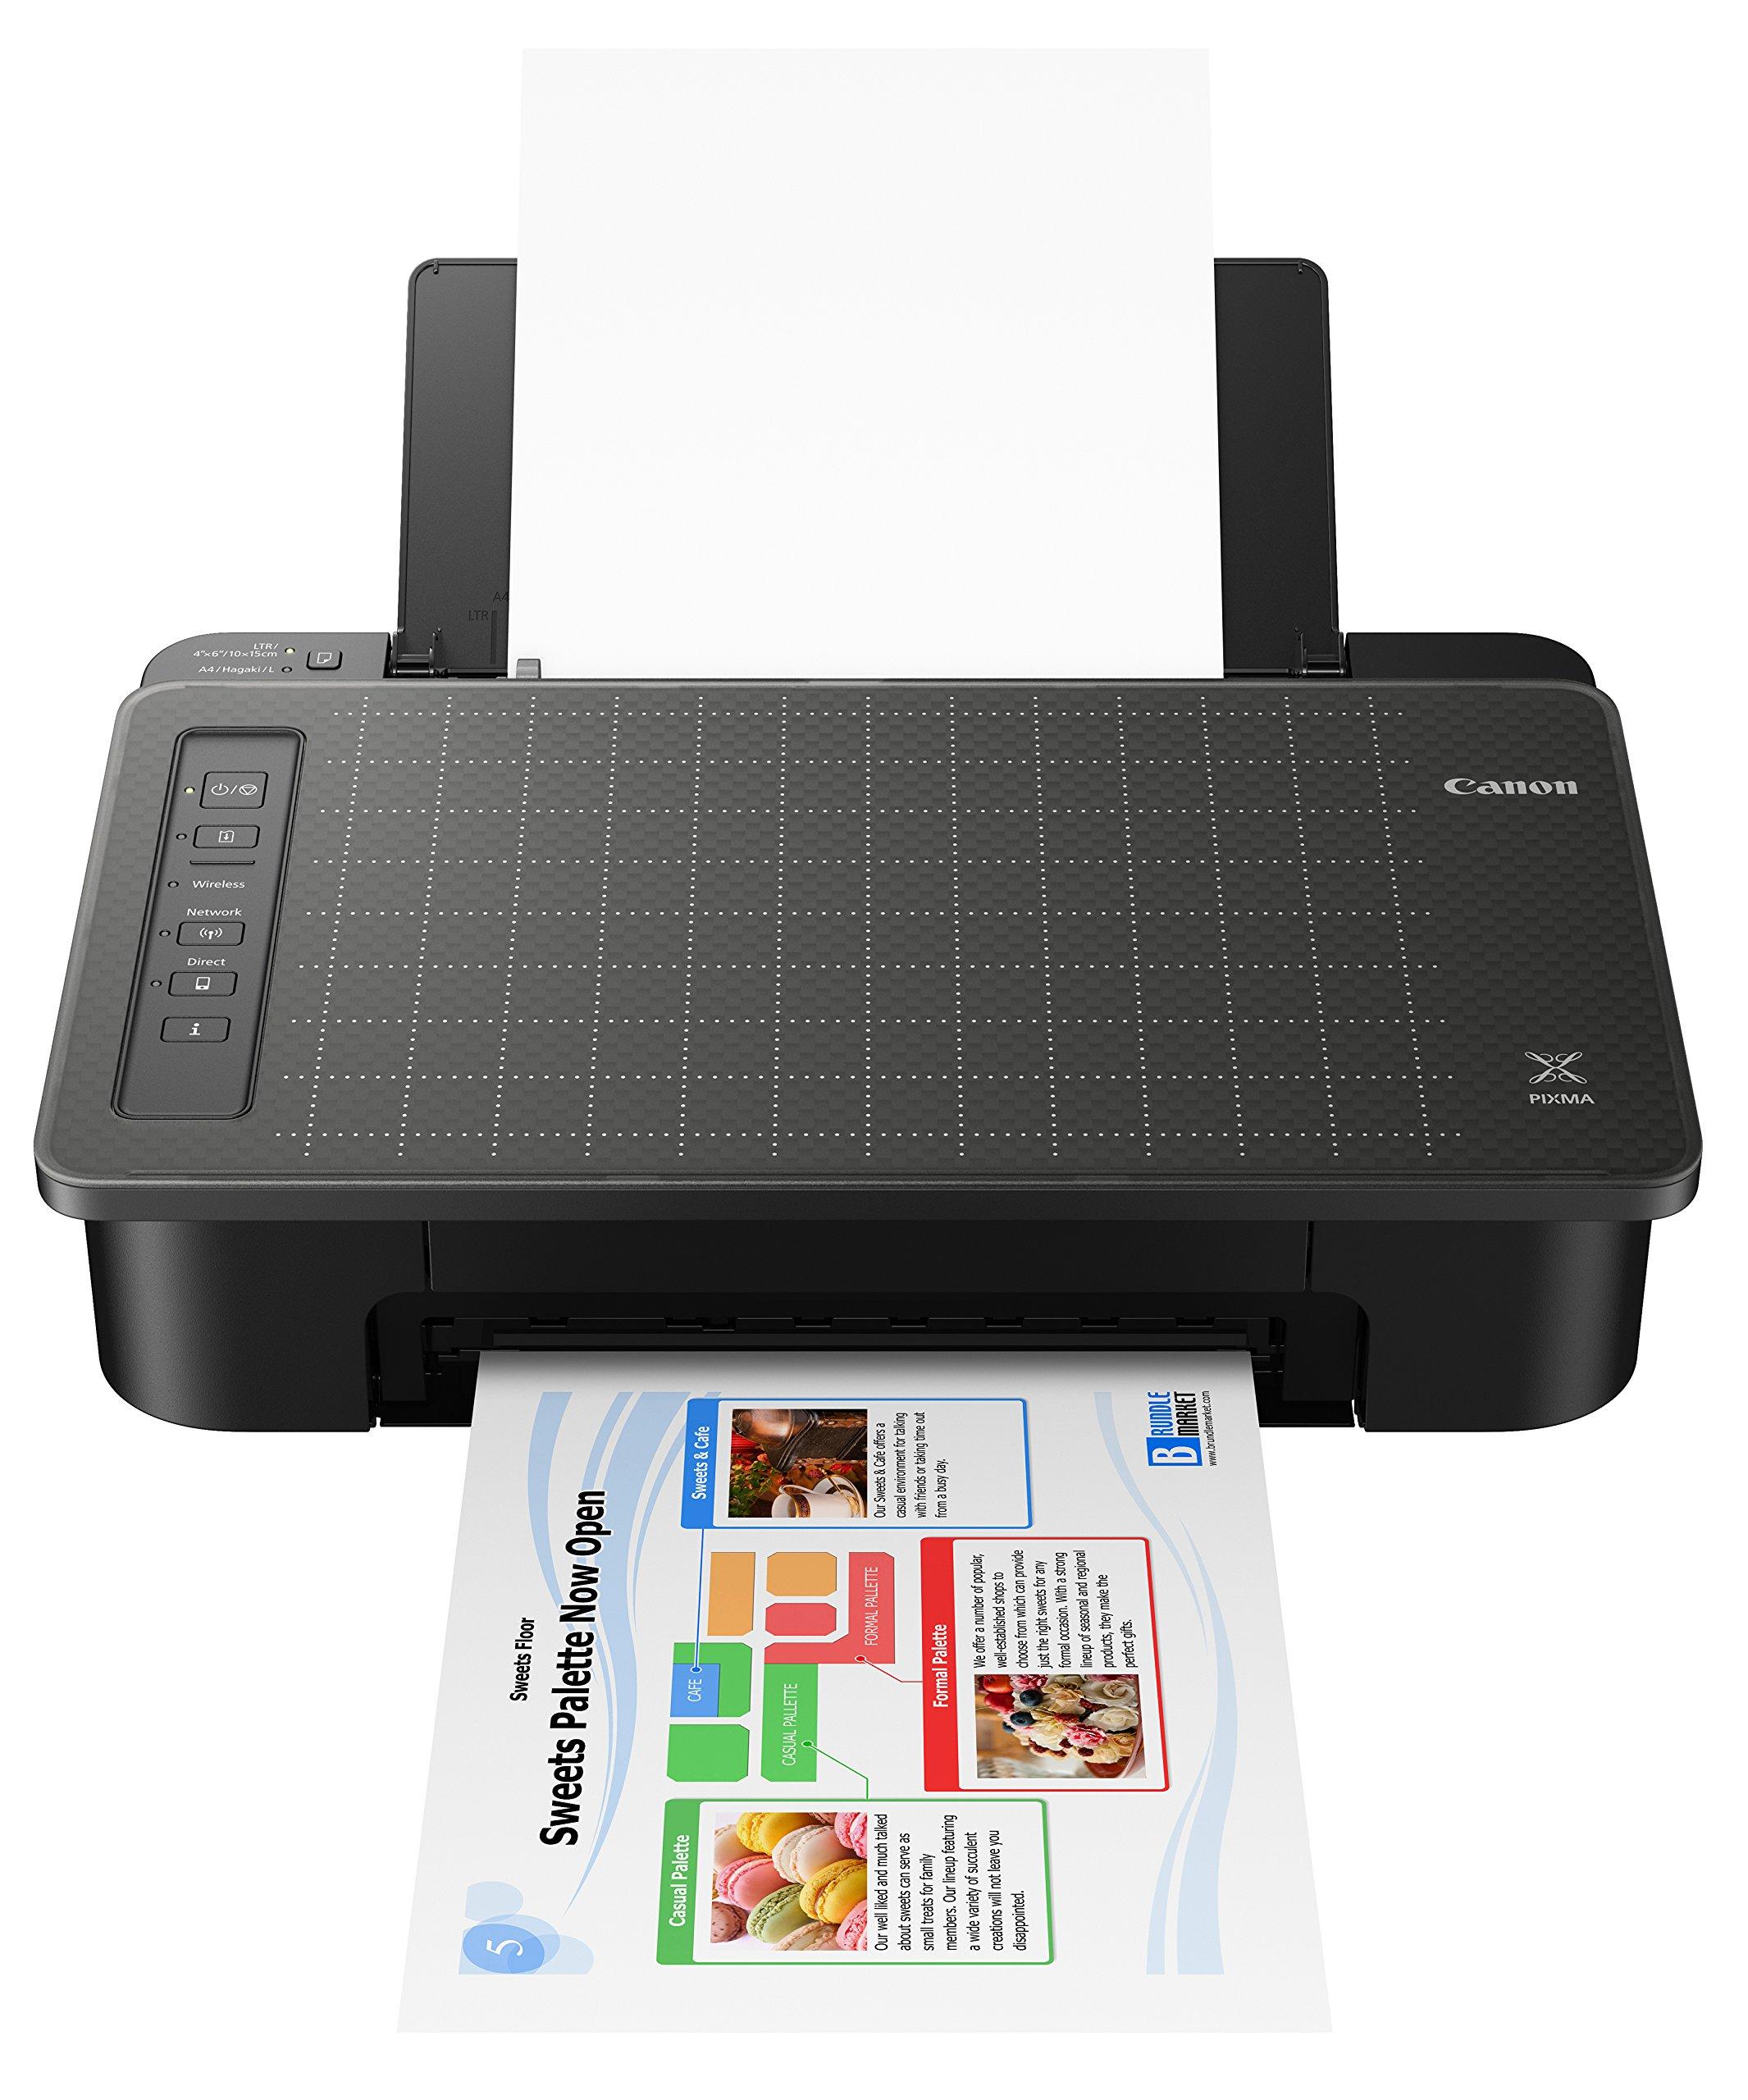 Canon TS302 Wireless Inkjet Printer, Black (2321C002)